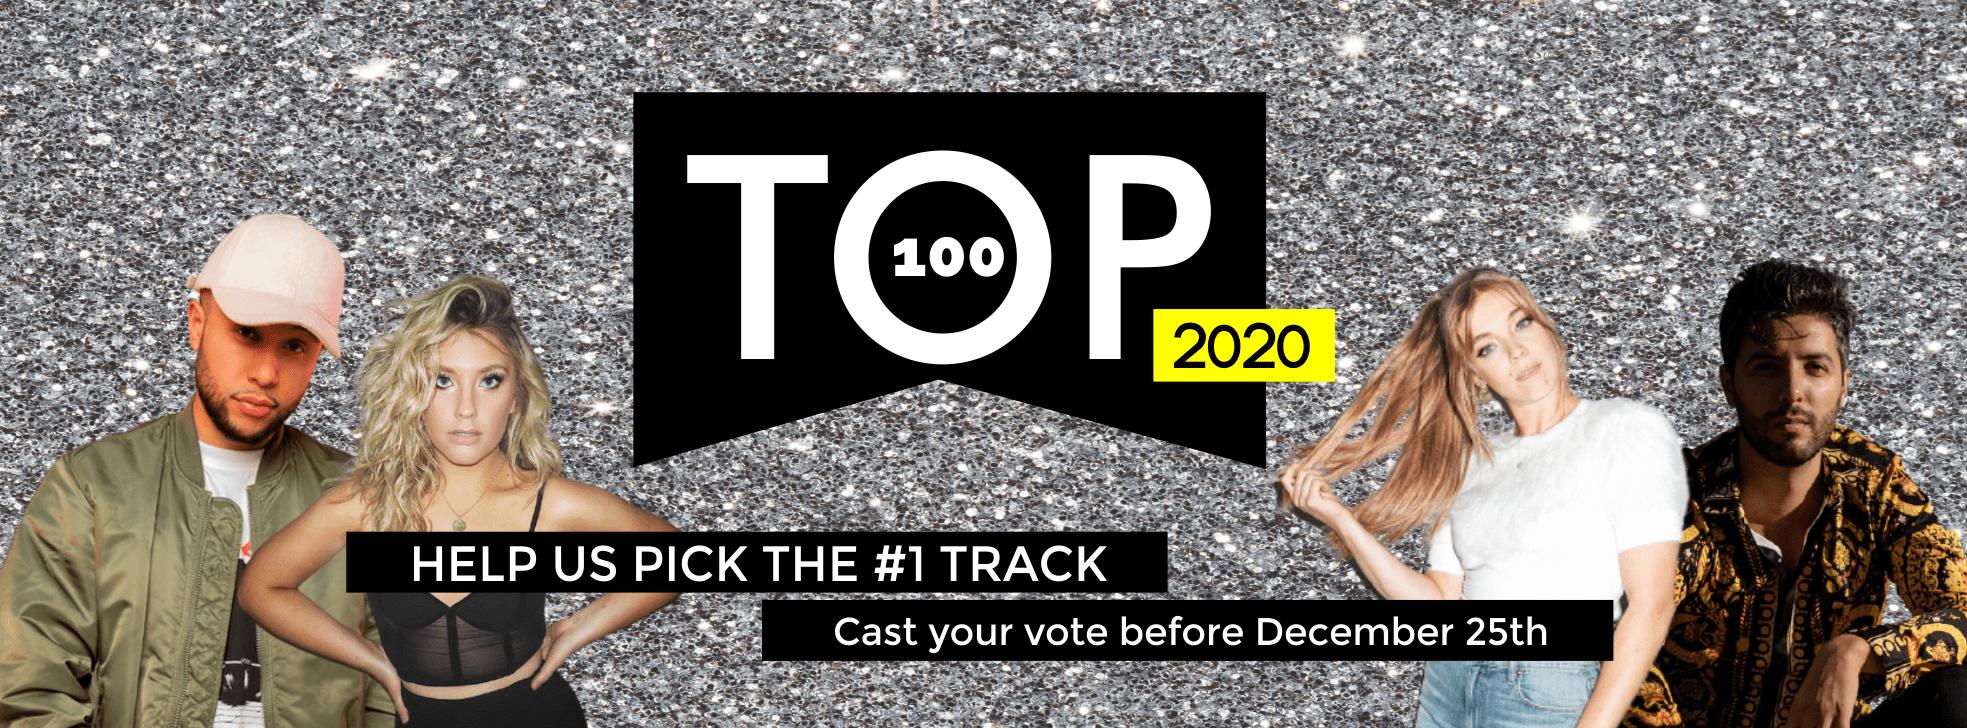 top100 vote